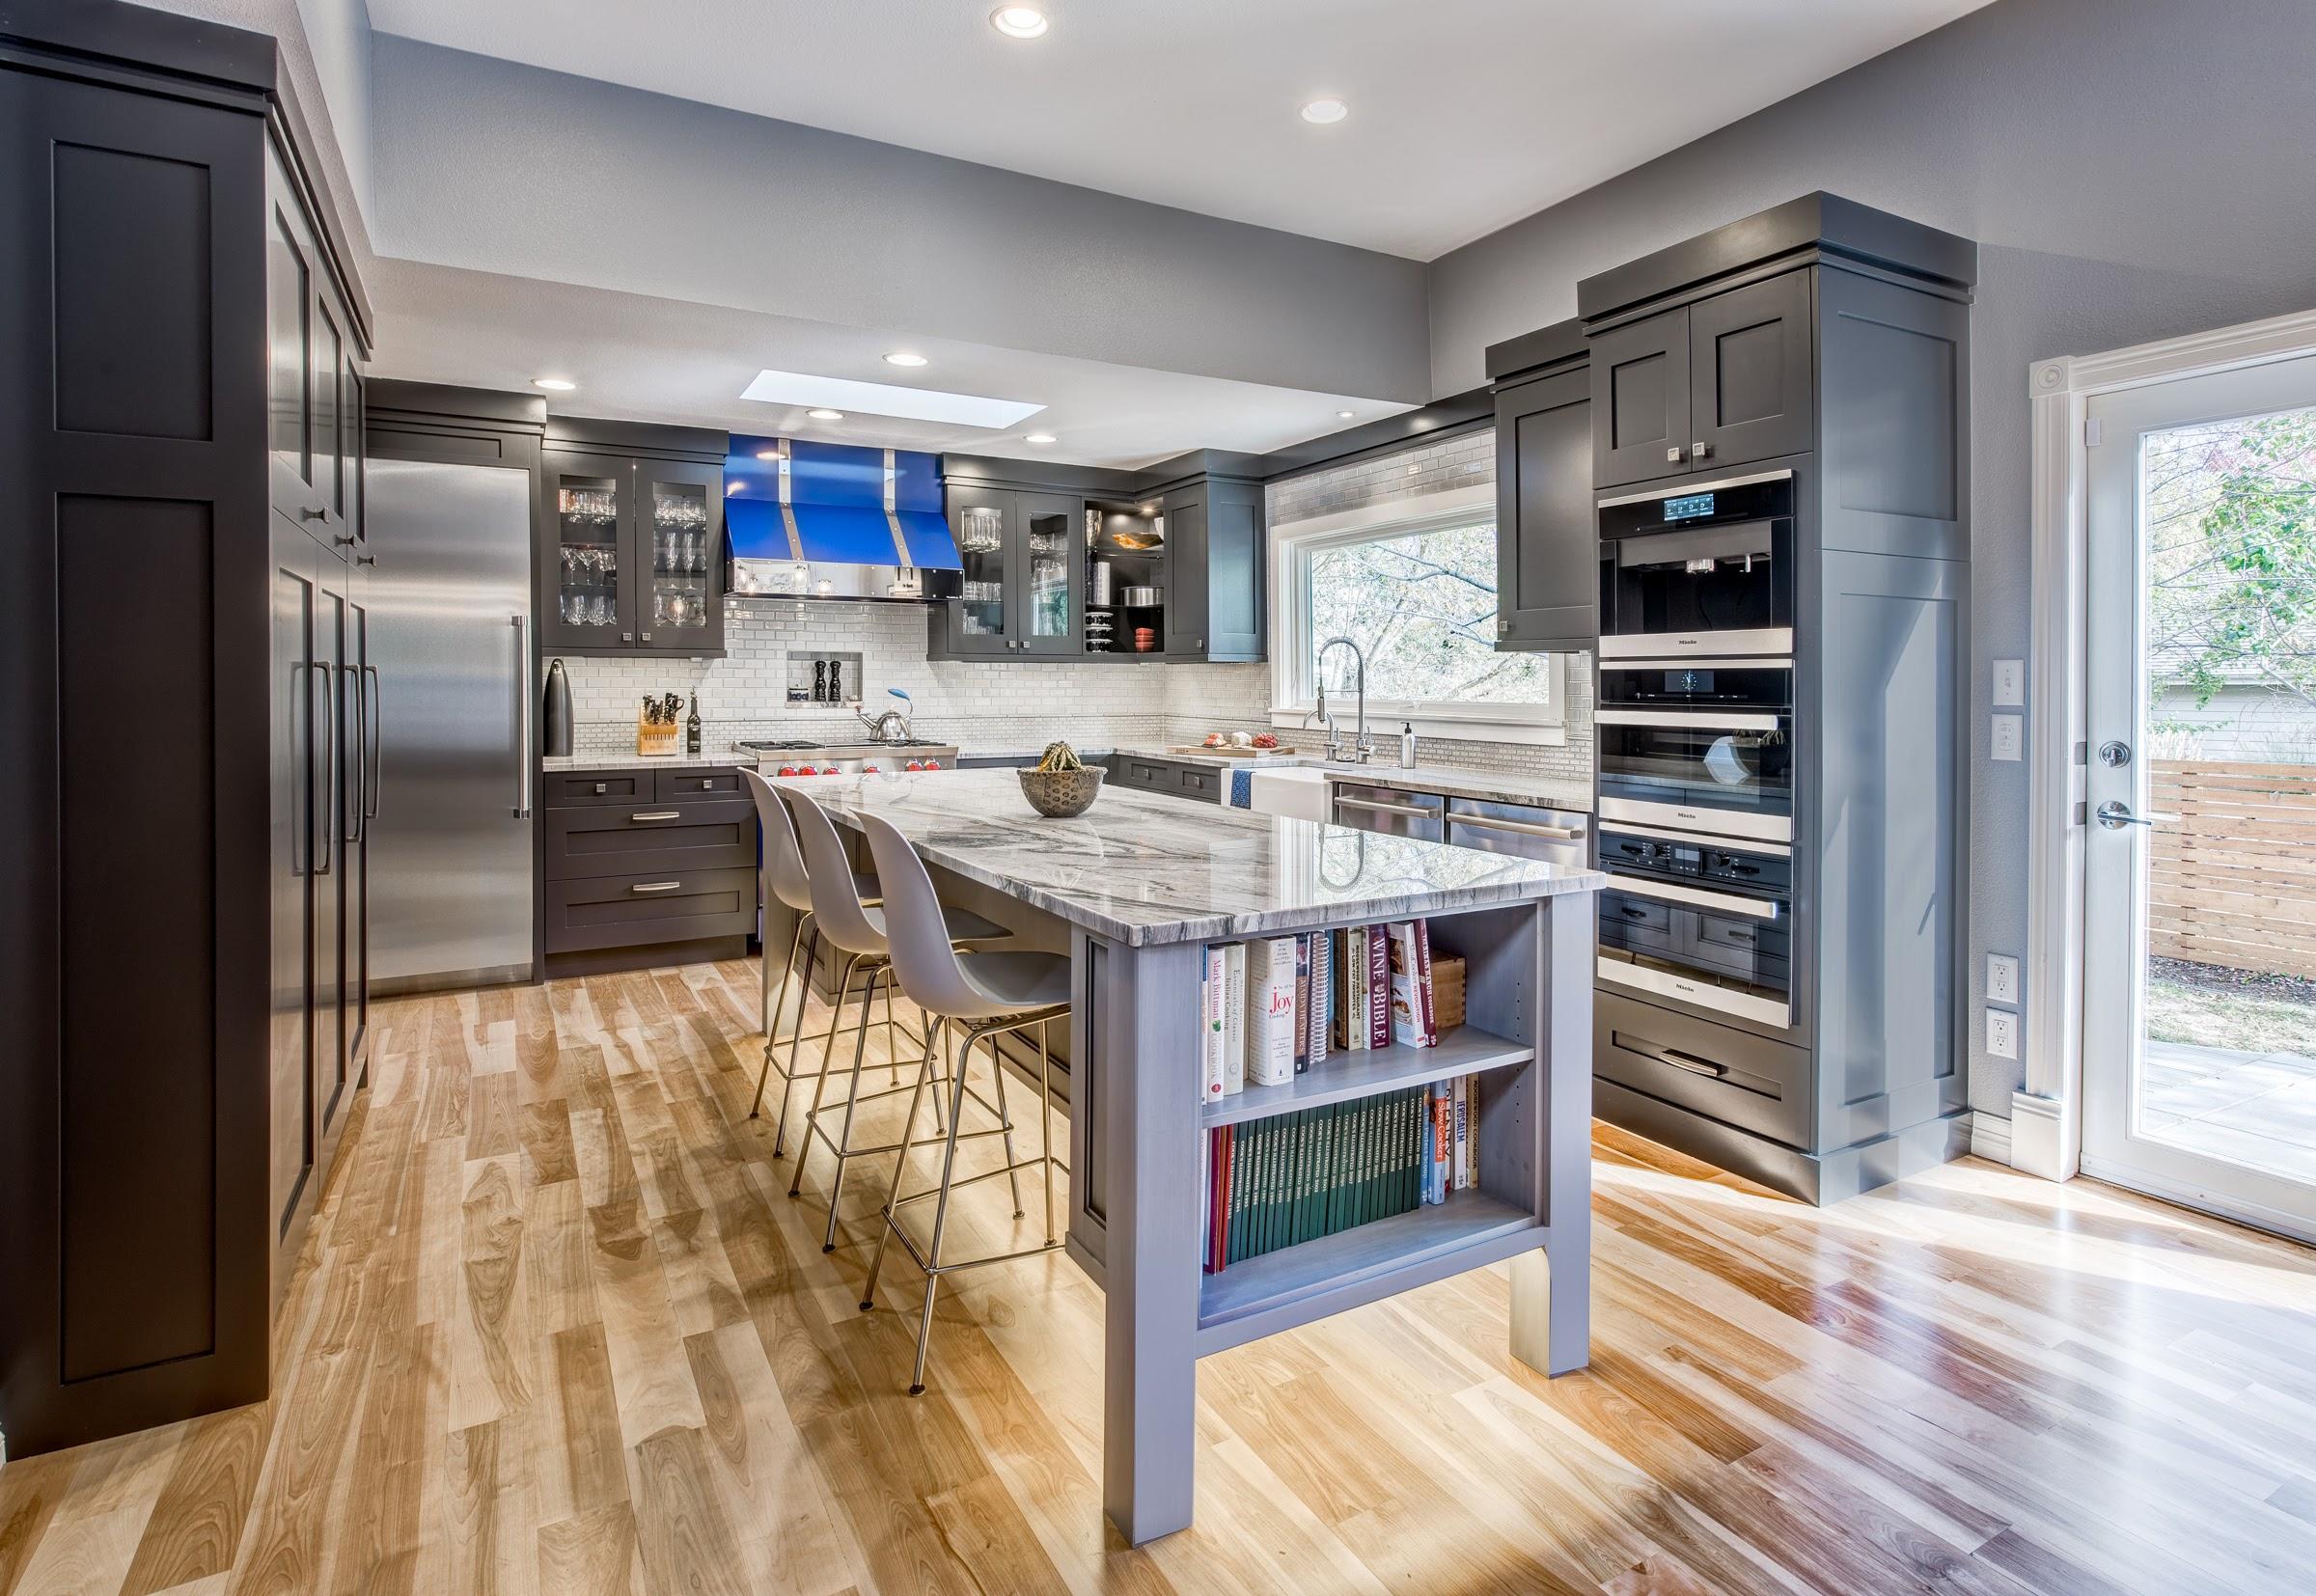 Project Vinca Ct. Craftsman - Kitchen View 1